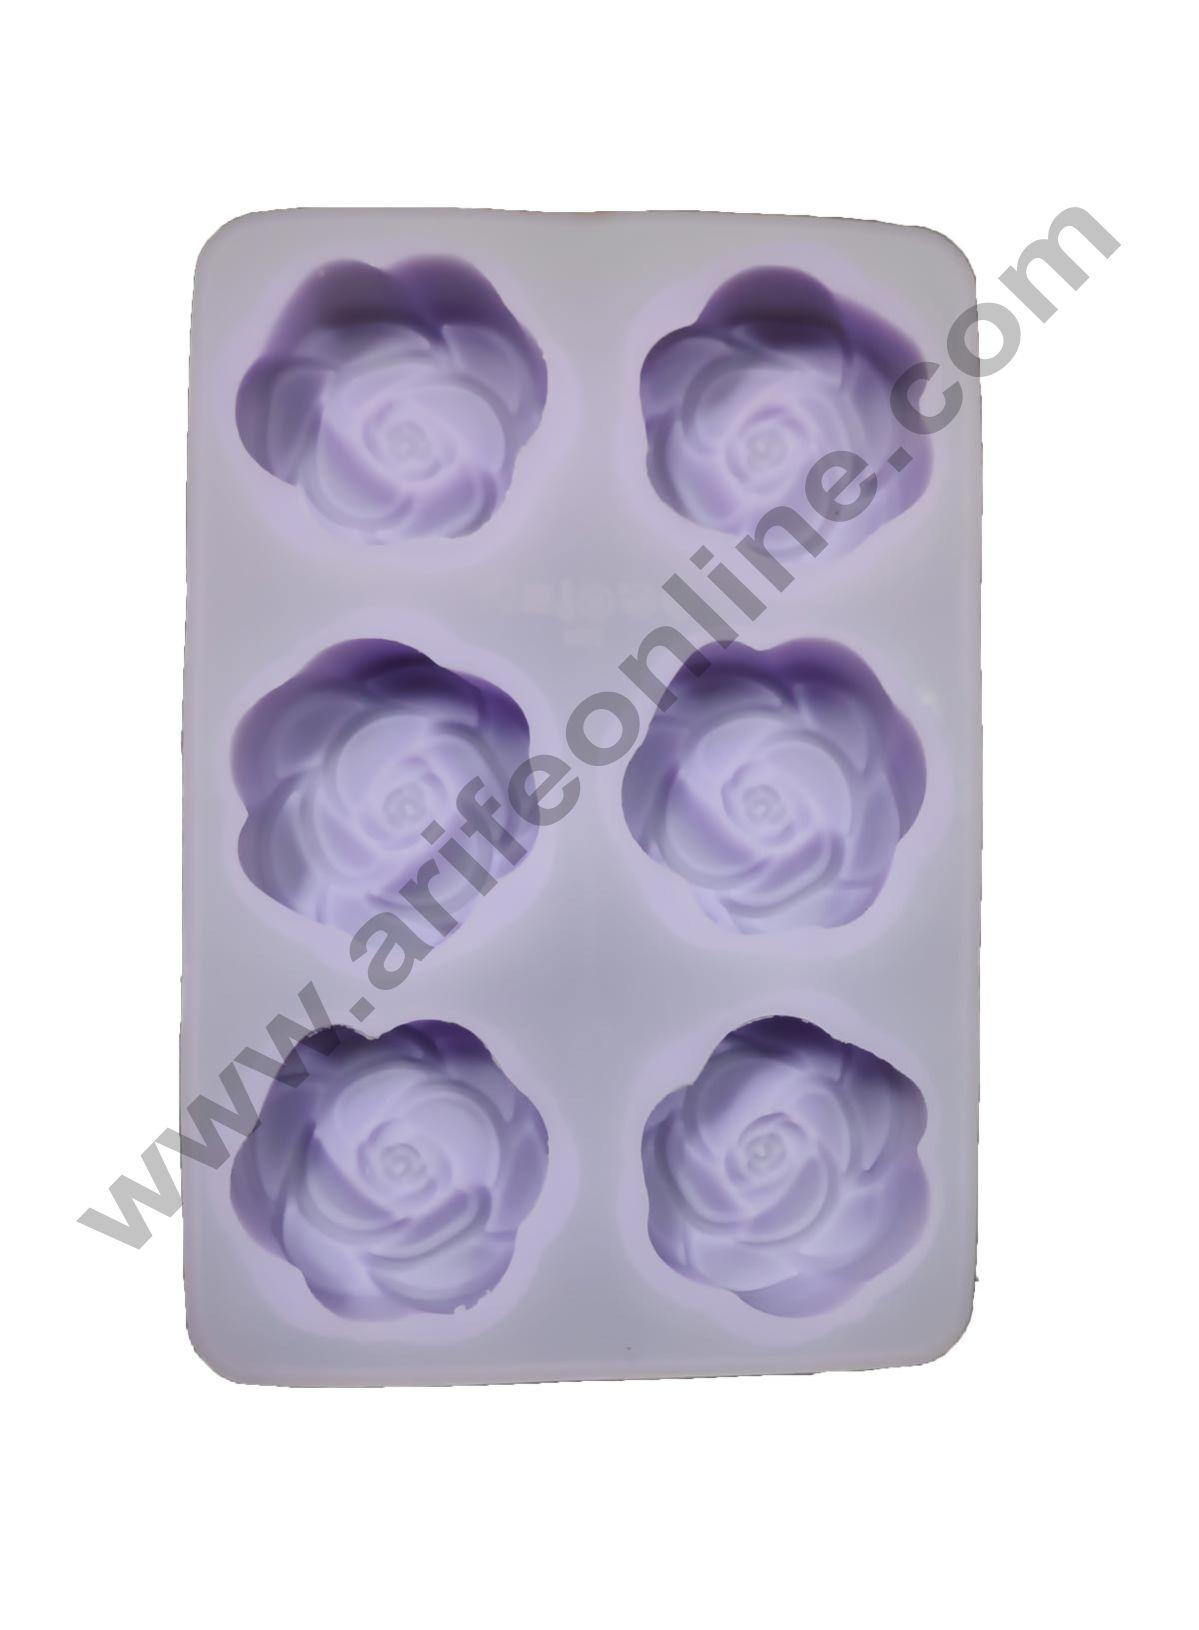 Cake Decor Silicon 6 Cavity, Rose Shape, Non Sticky Mold for soap,Chocolate, Fondant Sugar bakeware Mold